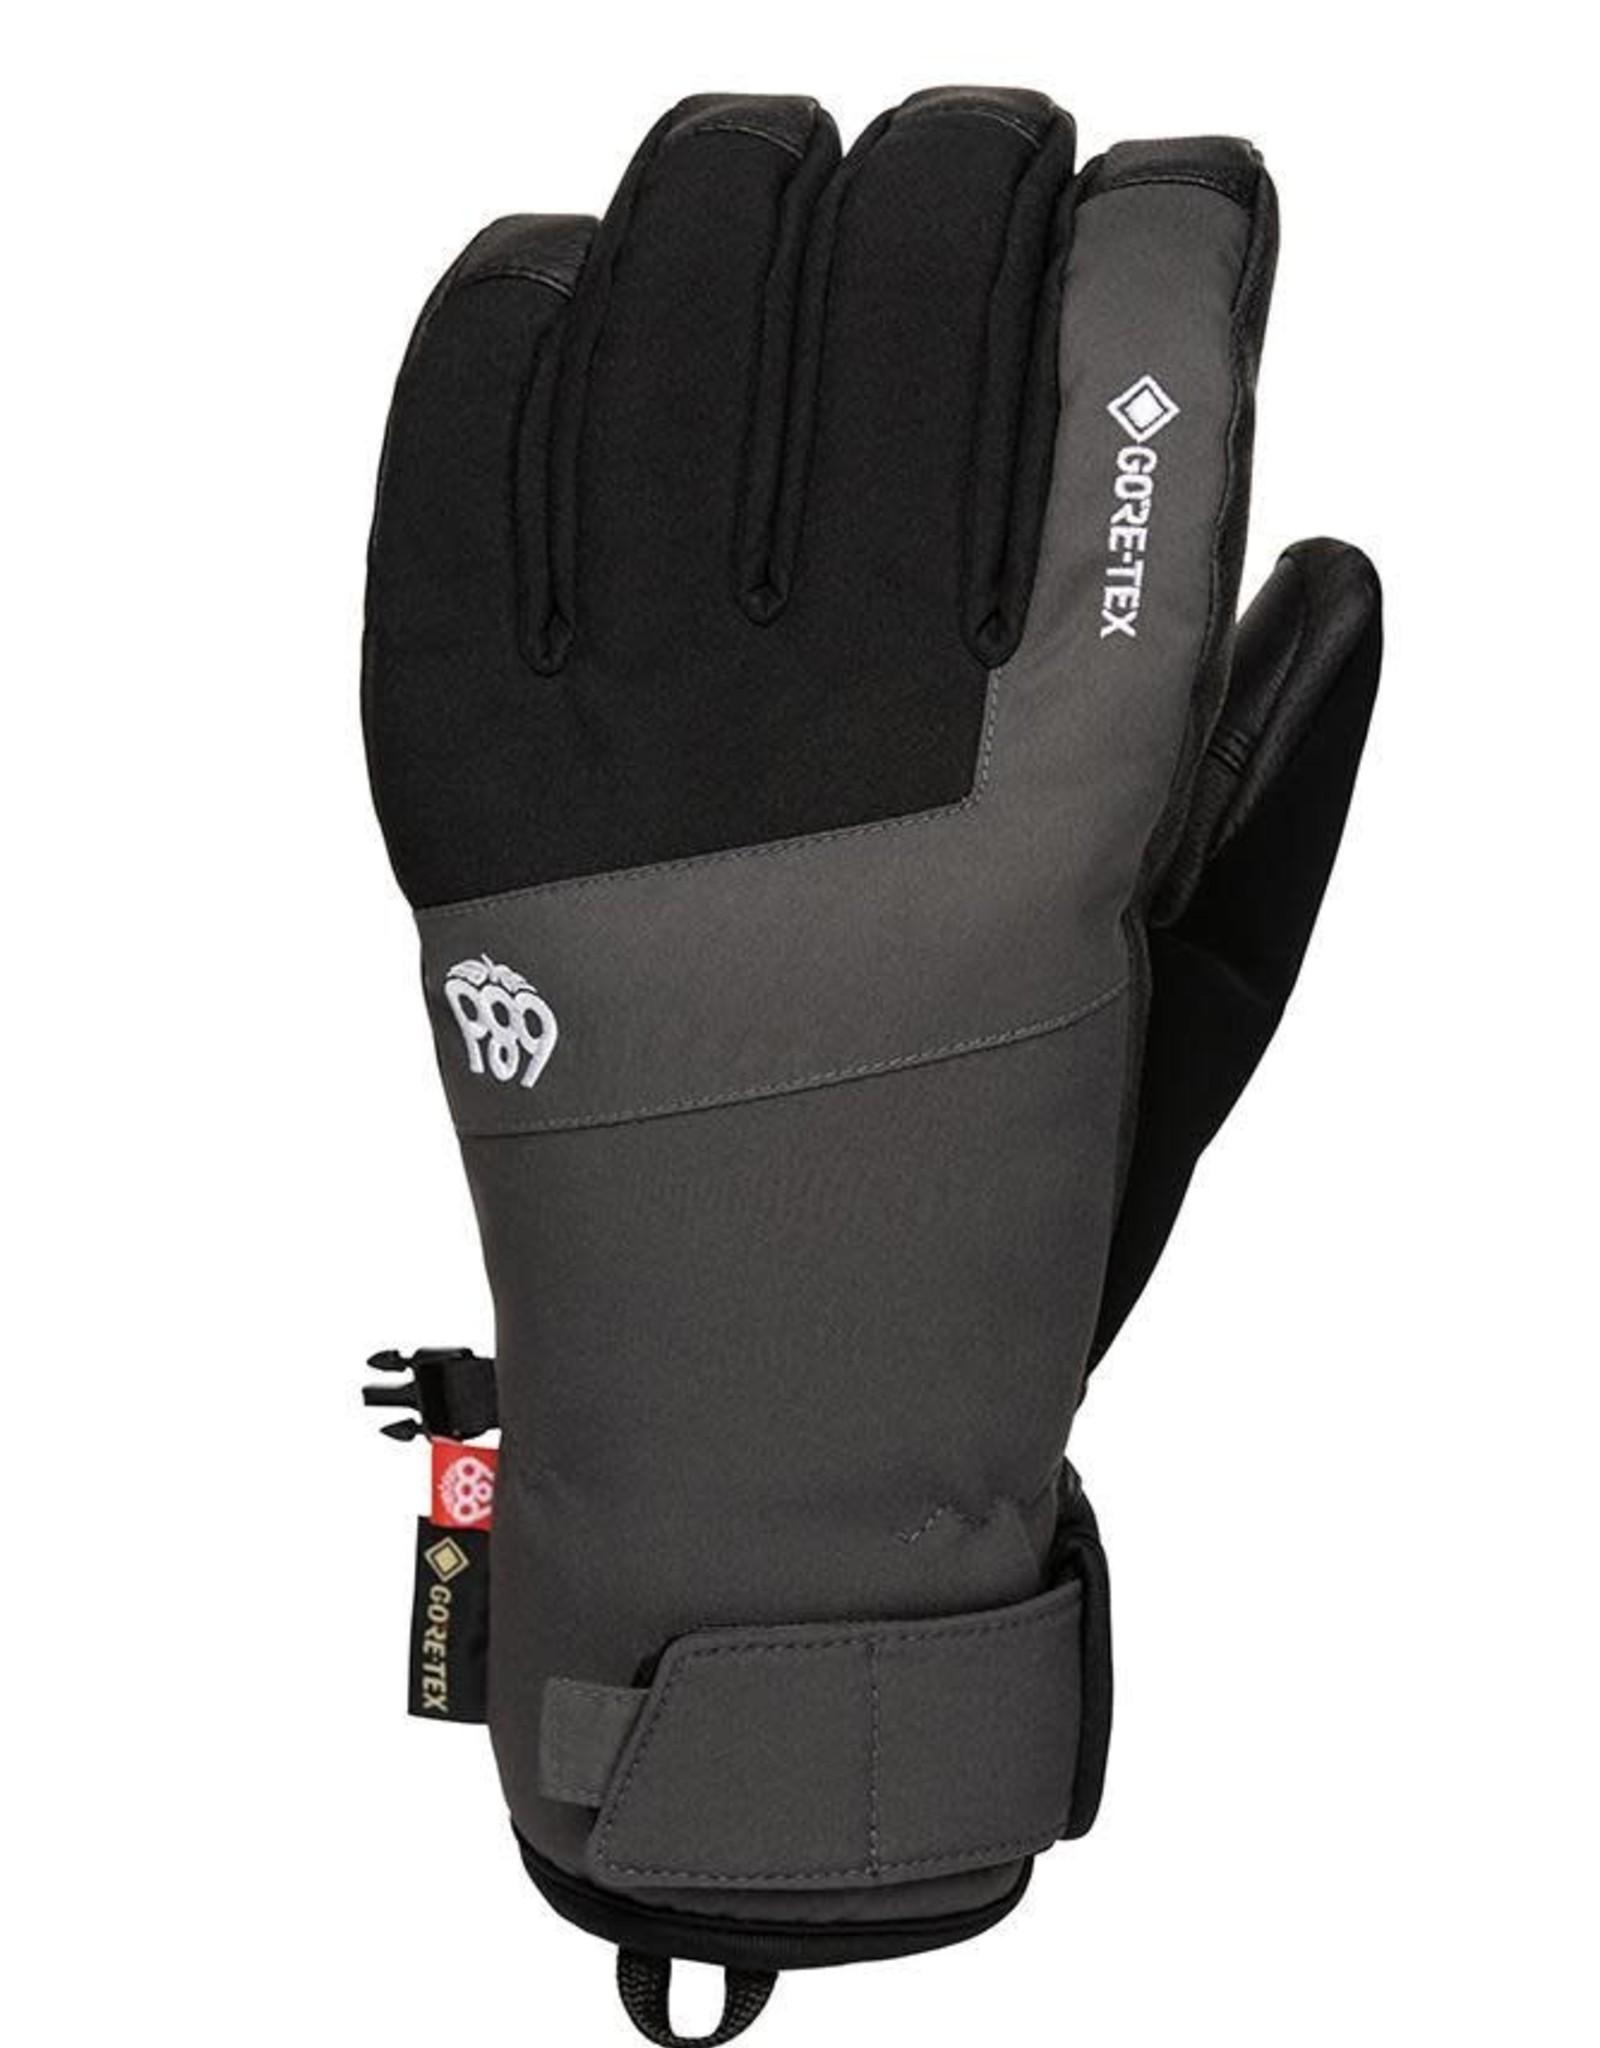 686 686 - Mens LINEAR GORE UNDER Glove - Char -